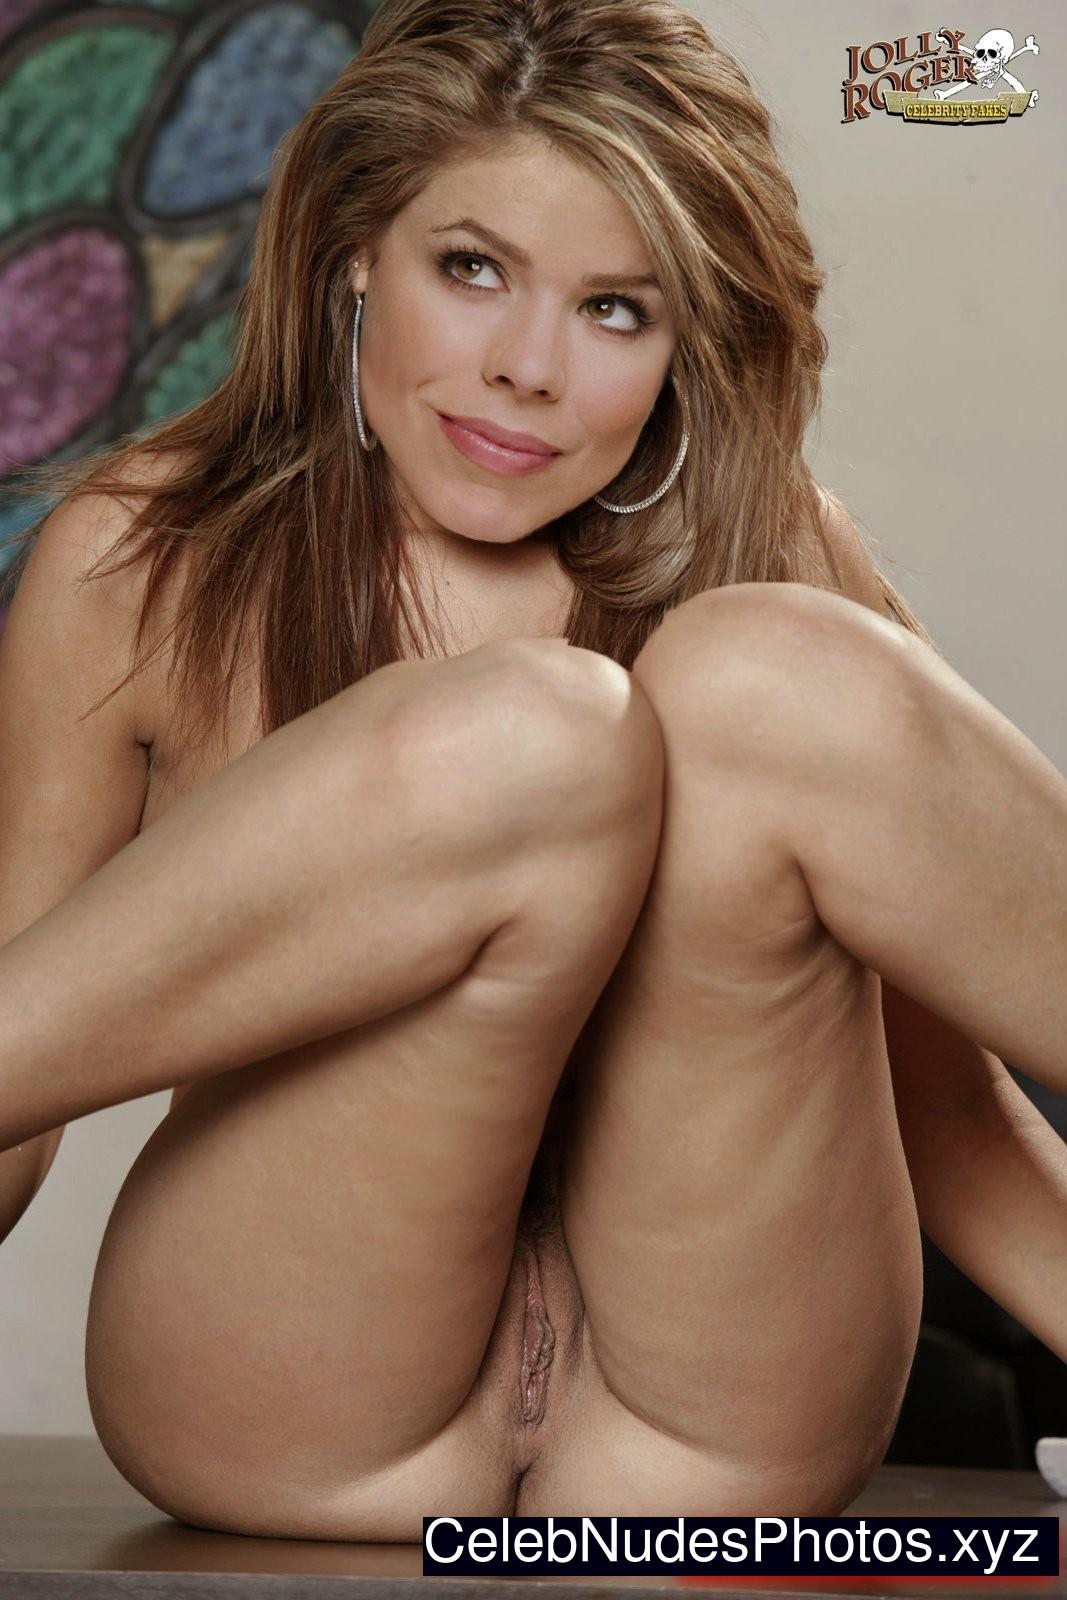 Molly ringwald tits